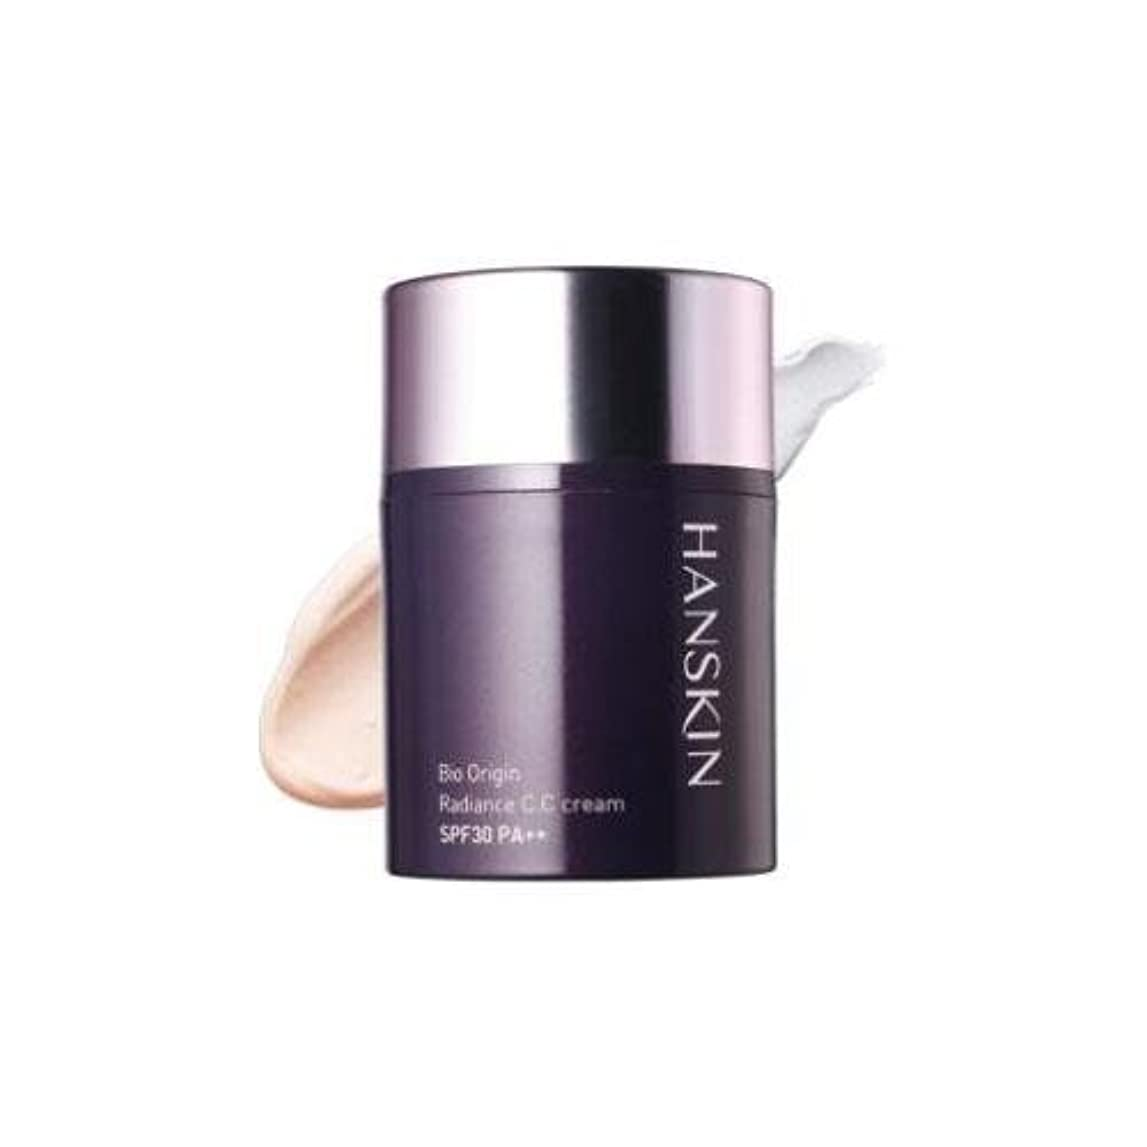 HANSKIN Bio Origin Radiance C.C Cream (SPF30PA++) 30ml/ Made in Korea